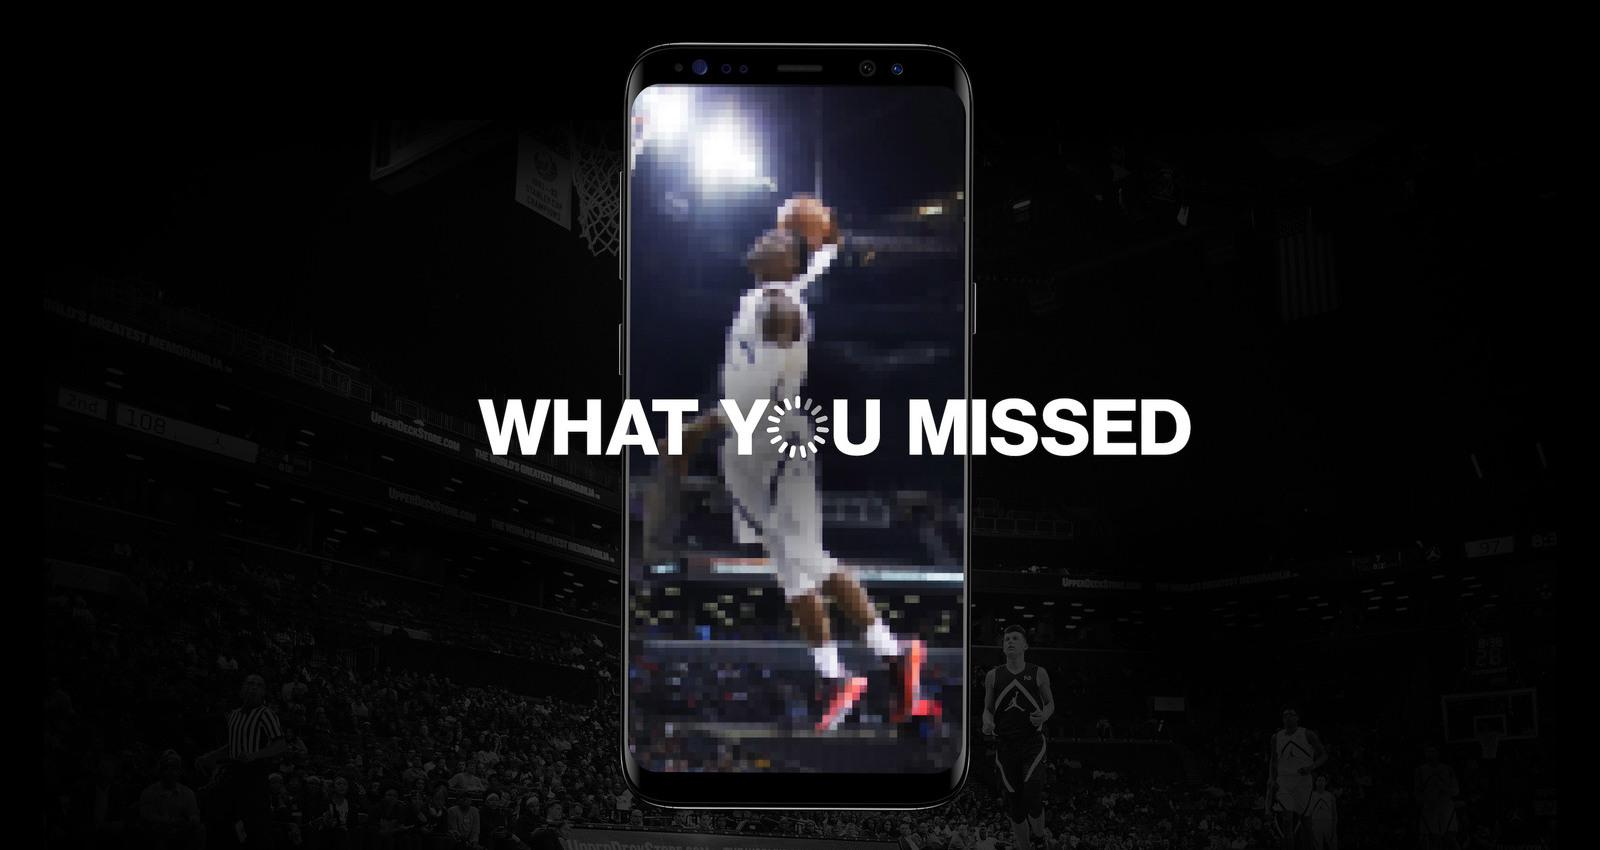 Verizon What You Missed